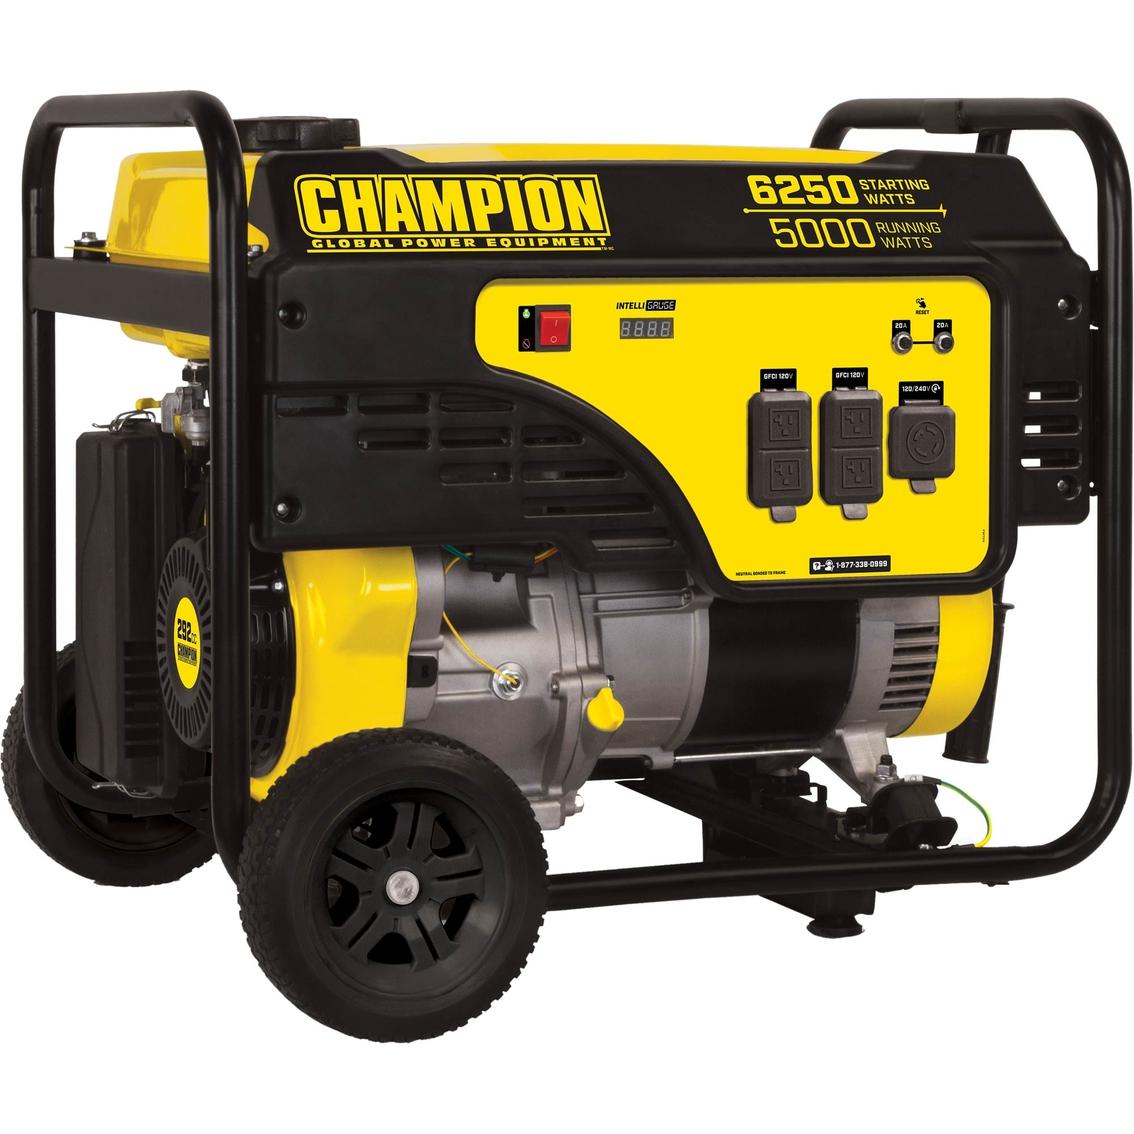 Champion 5000w Portable Generator With Wheel Kit ...